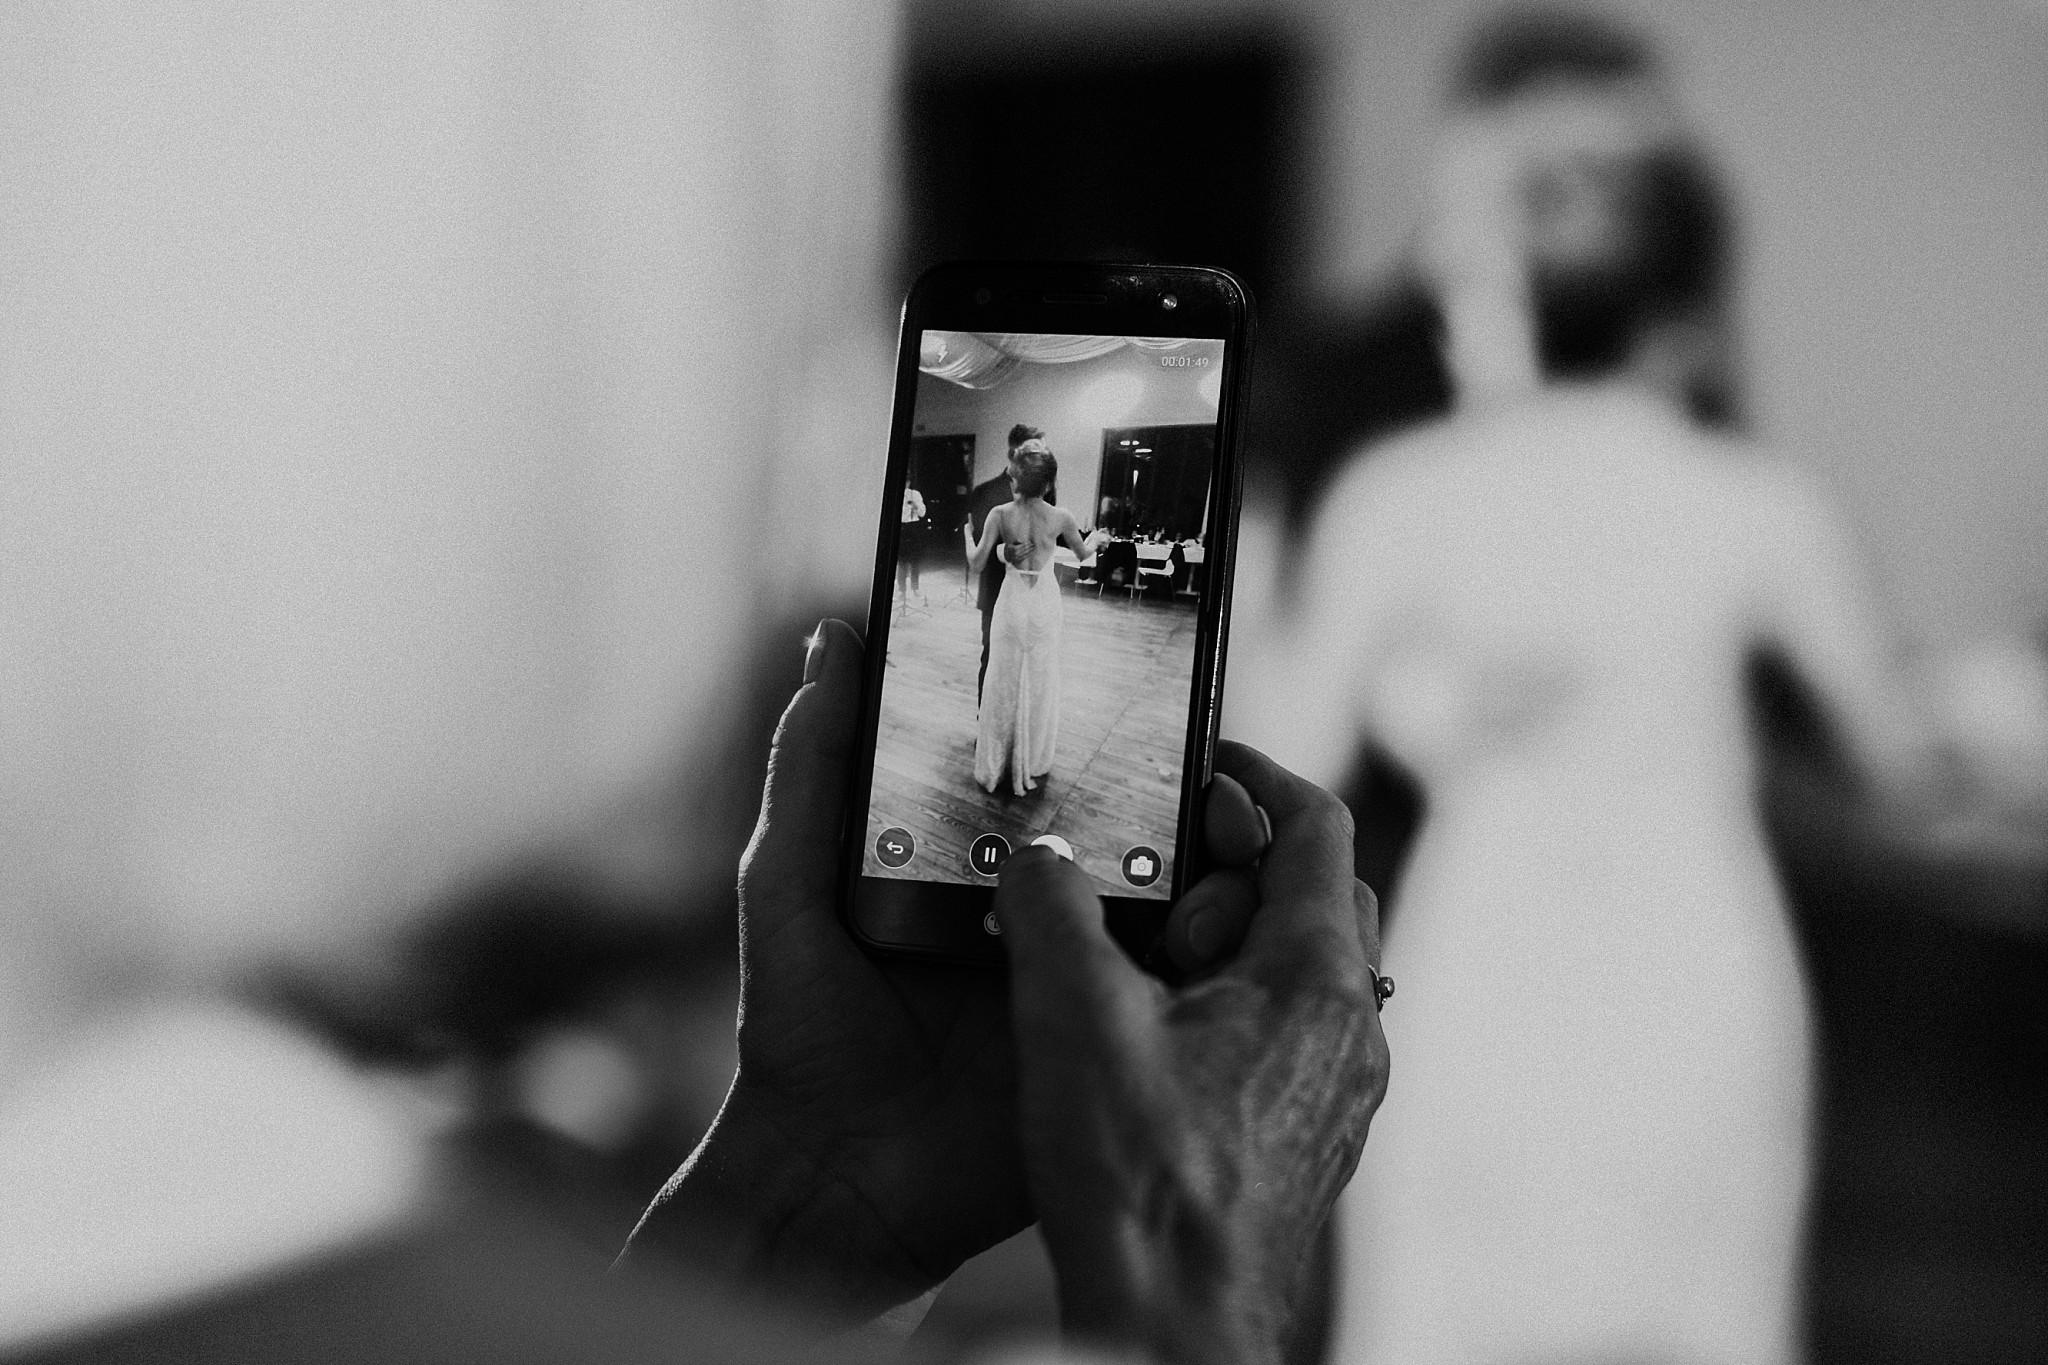 fotograf poznan wesele dobra truskawka piekne wesele pod poznaniem wesele w dobrej truskawce piekna para mloda slub marzen slub koronawirus slub listopad wesele koronawirus 466